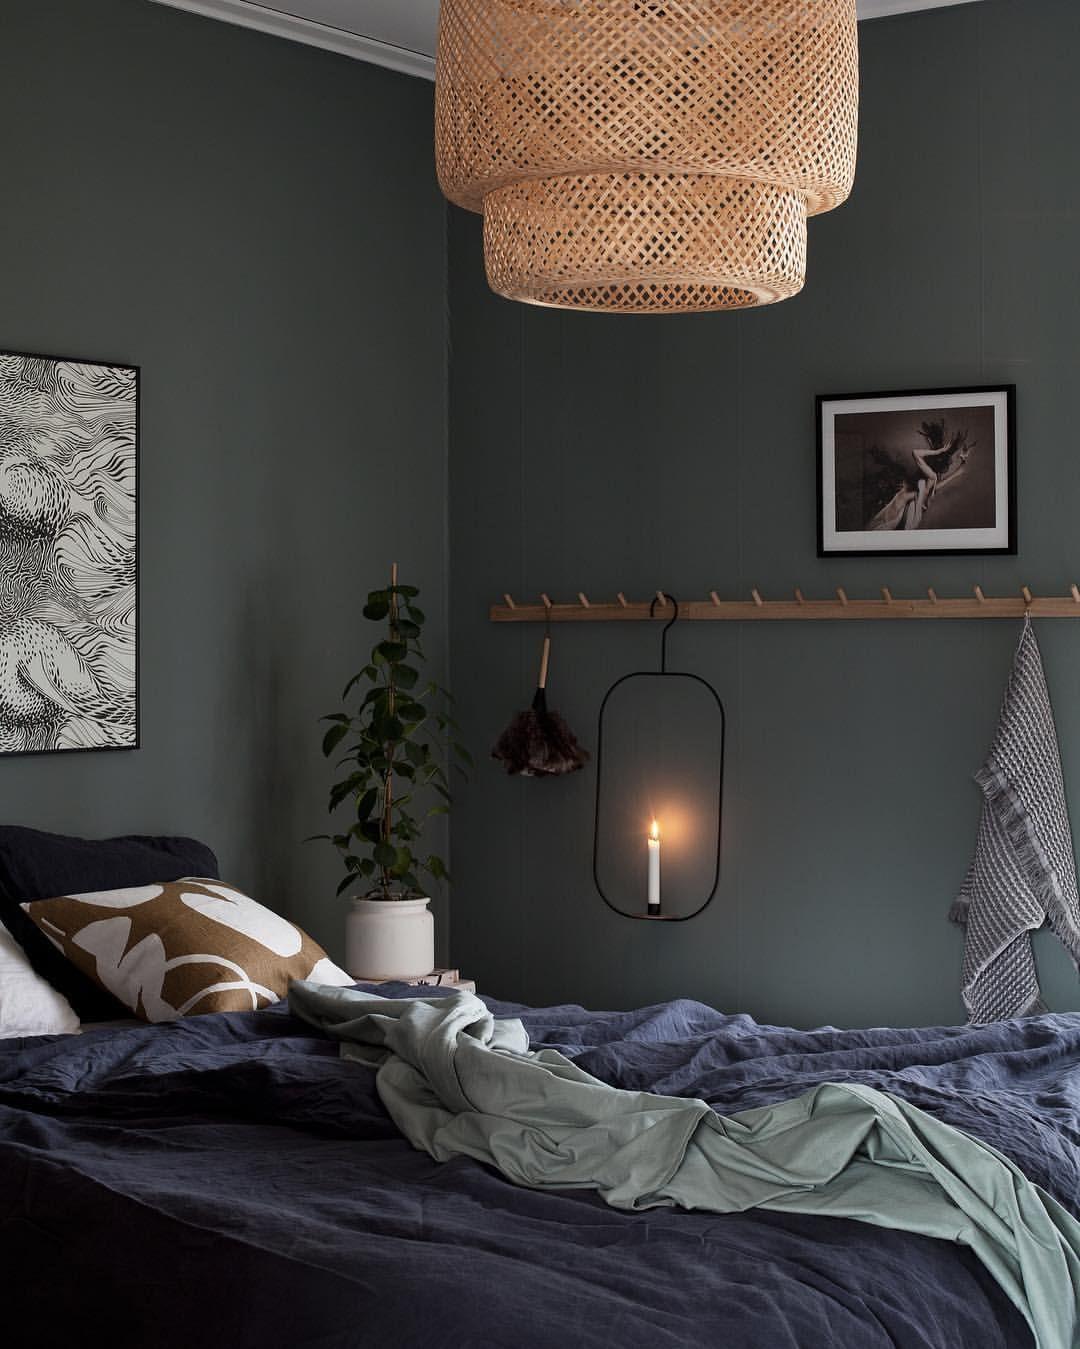 "Gefällt 715 Mal, 37 Kommentare - bloggaibagis /// Janniche (@bloggaibagis) auf Instagram: ""Mera sovrum!  #sovrum #soverom #bedroom #sovrumsinspo #nordsjöfärg"""